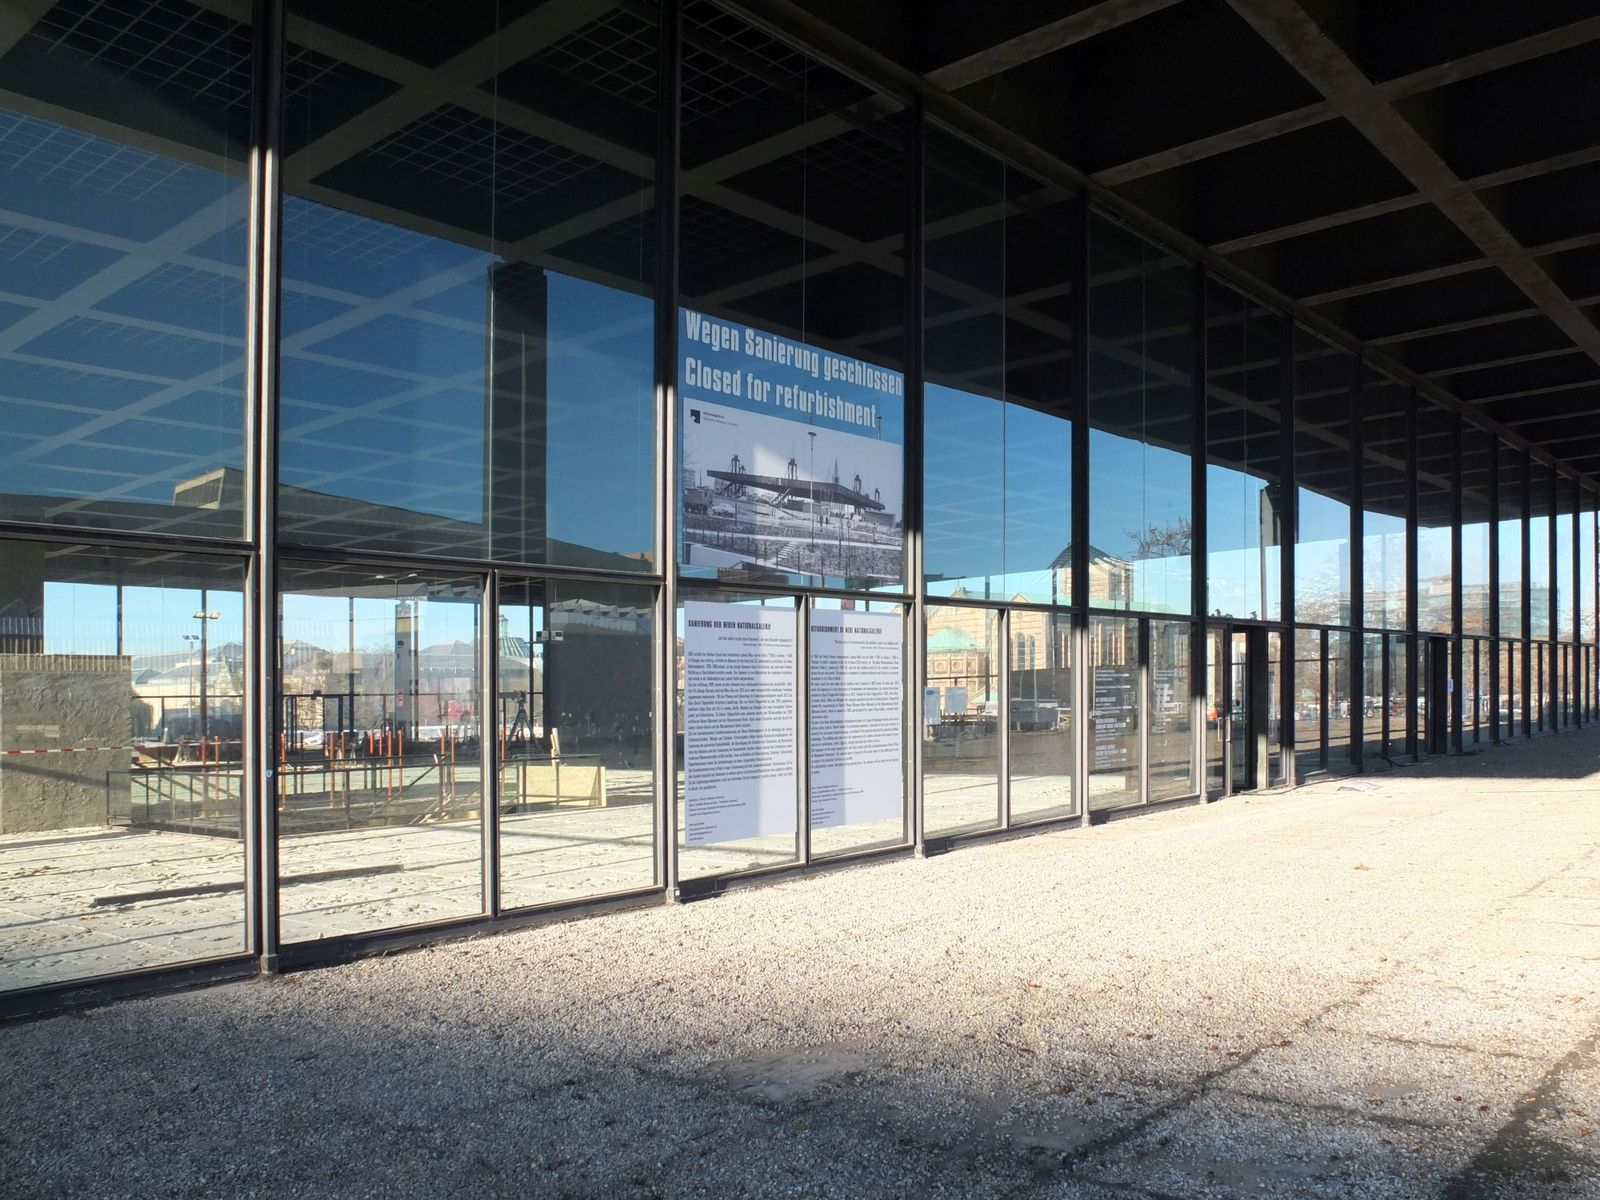 """Heute geschlossen wegen gestern"" © Staatliche Museen zu Berlin / schmedding.vonmarlin."